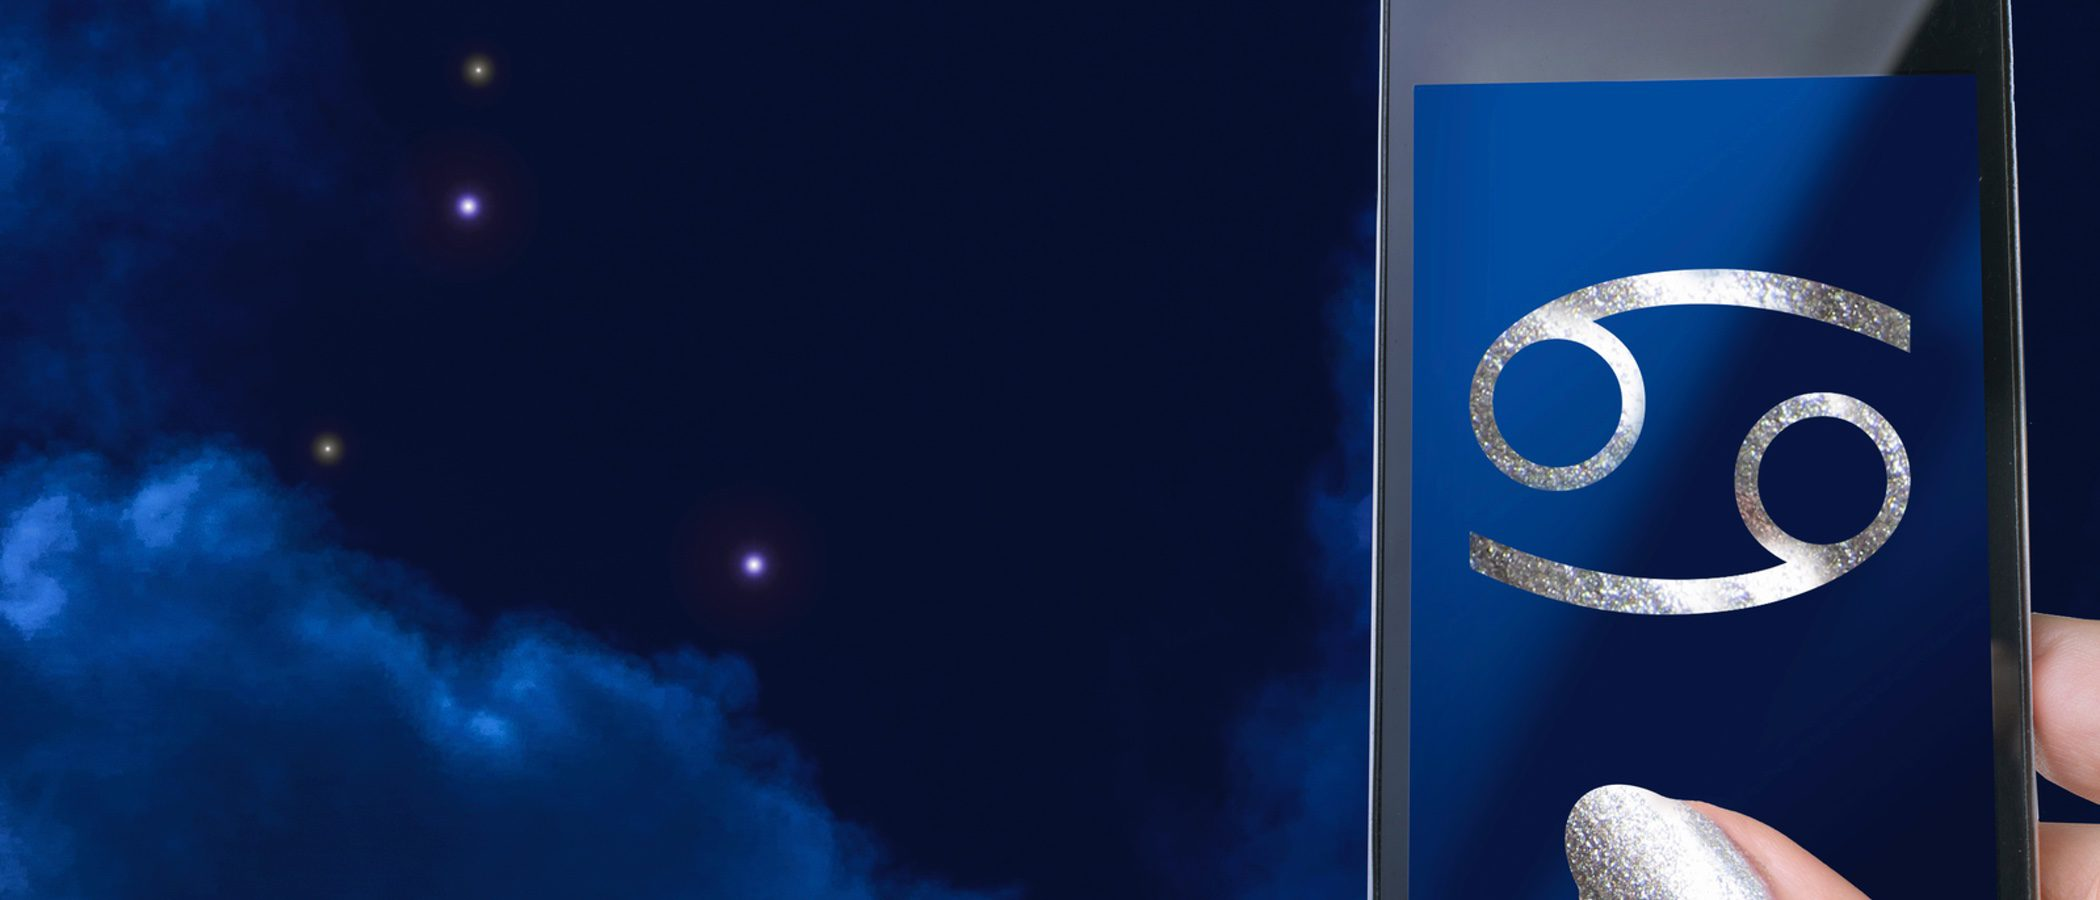 Horóscopo octubre 2016: Cáncer